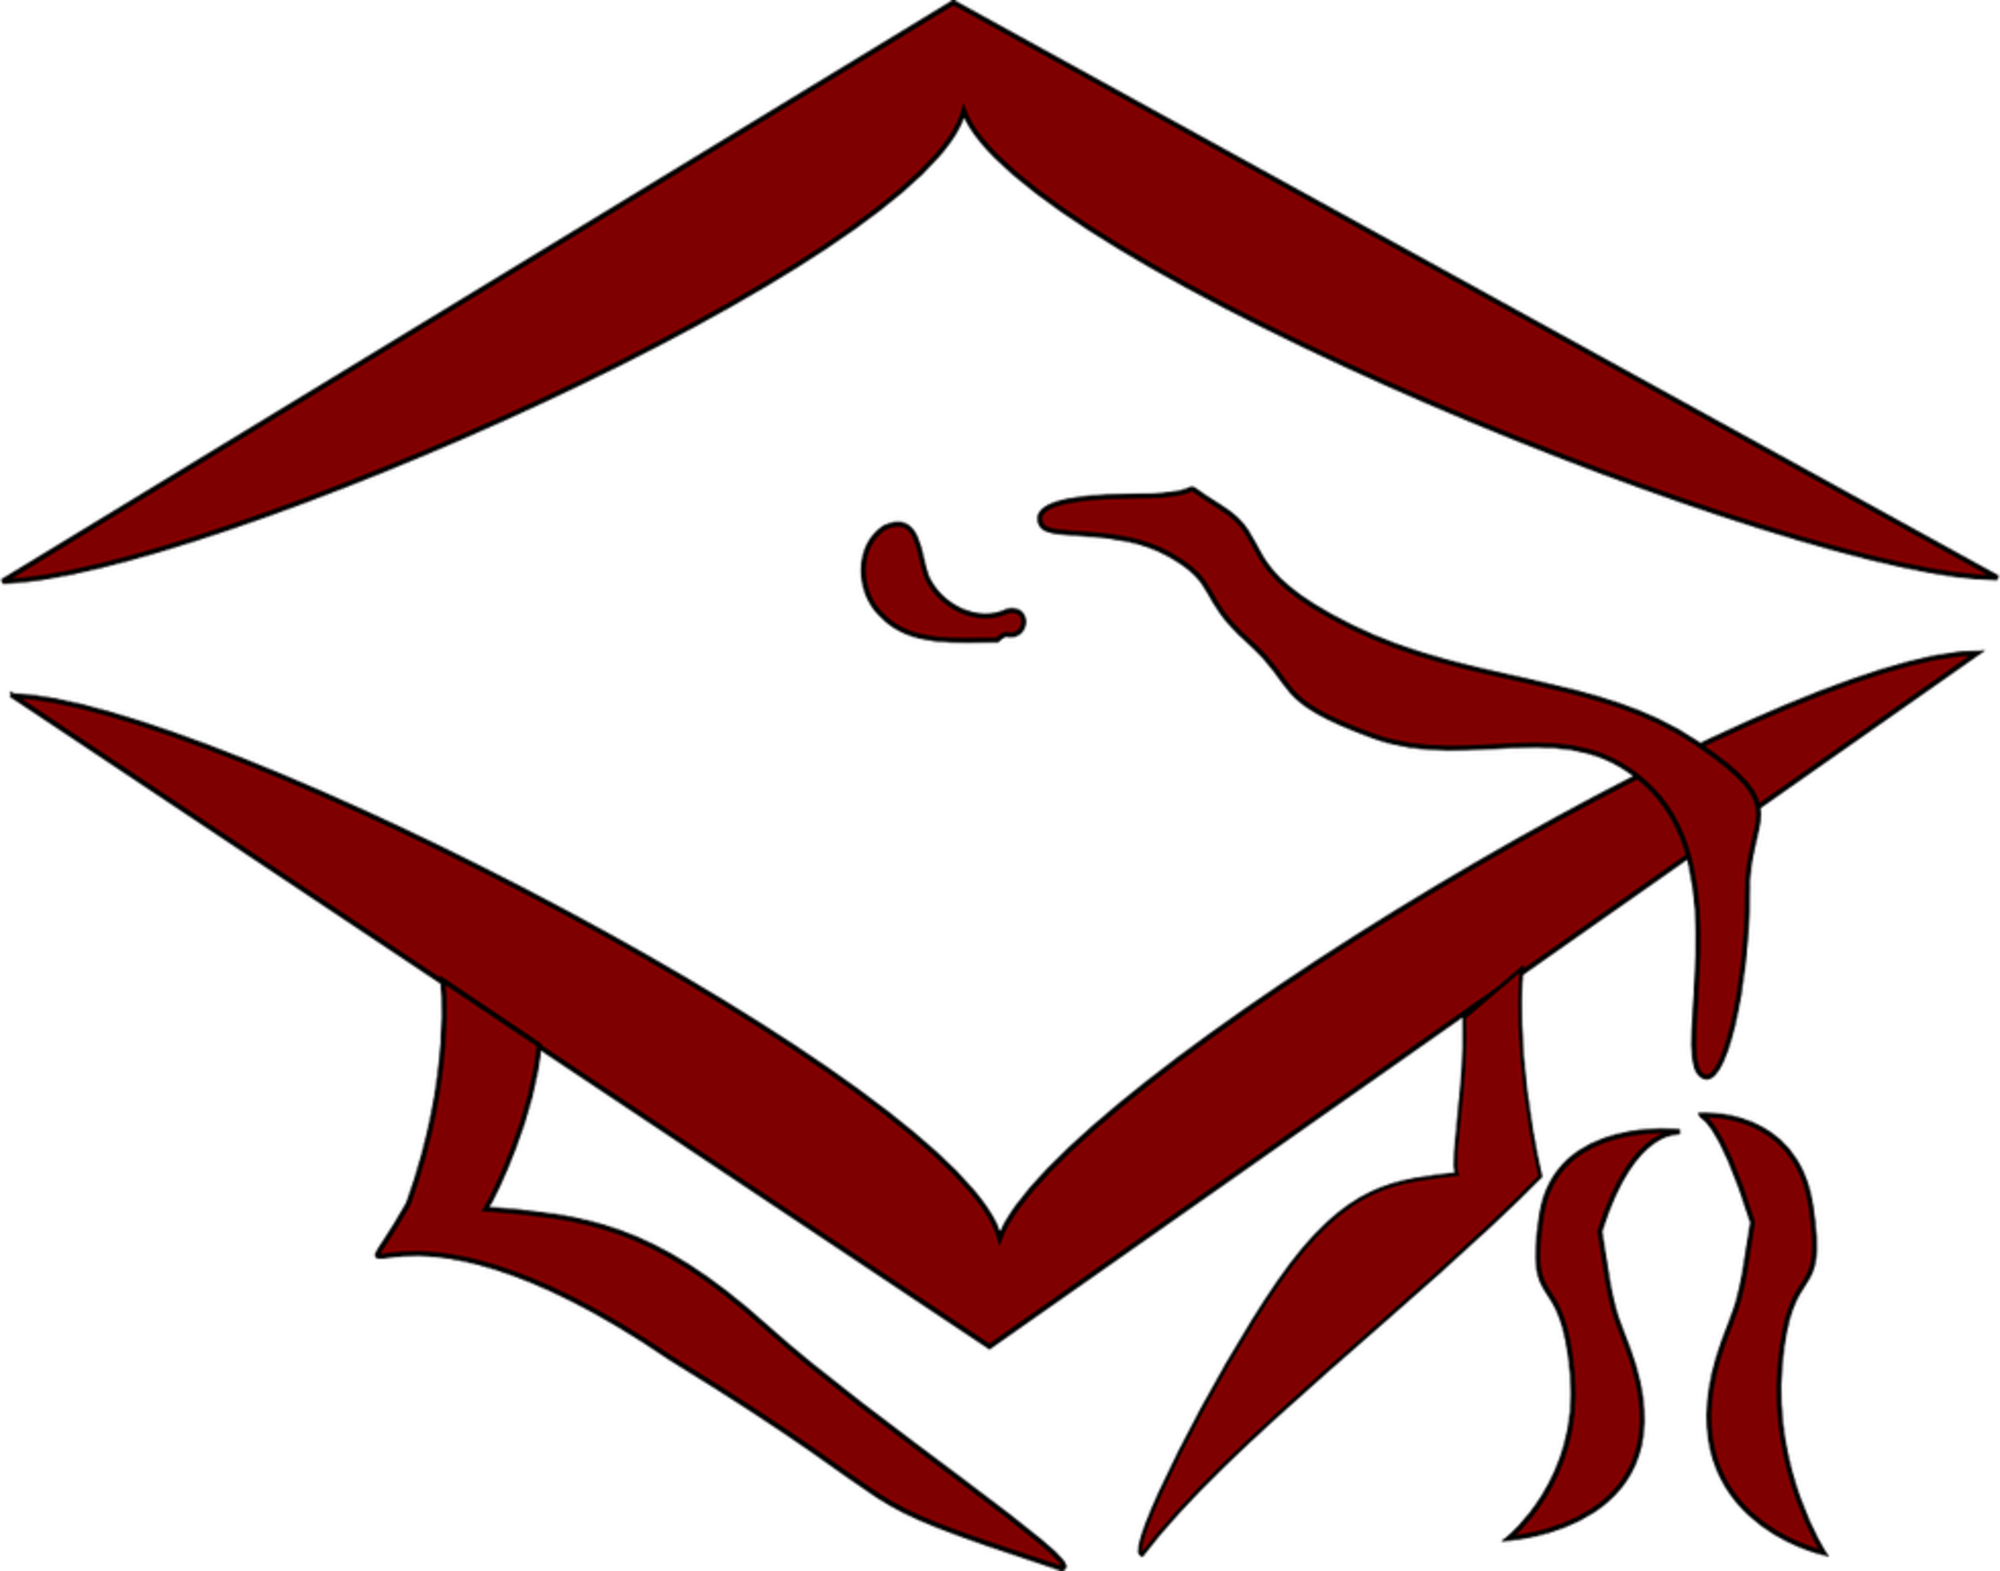 Gradation nursing cliparts black and whtie clip art freeuse download Nurse Clipart Diploma Graduation Cap Clip Art - Clip Art Library clip art freeuse download